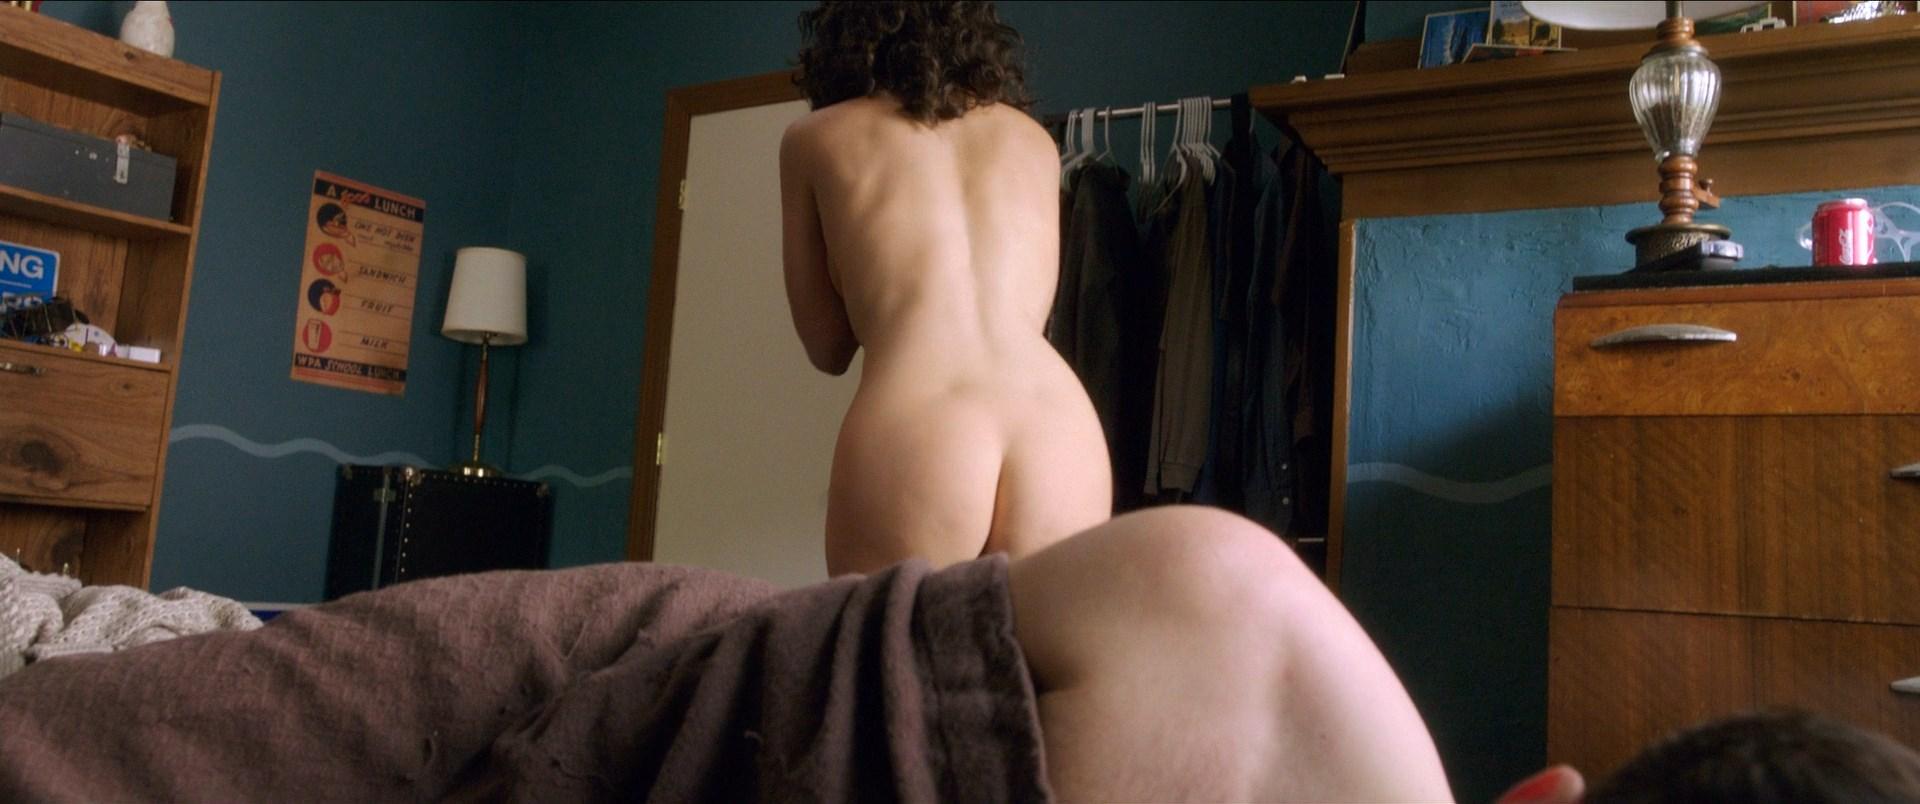 megan-boone-hot-sexy-nude